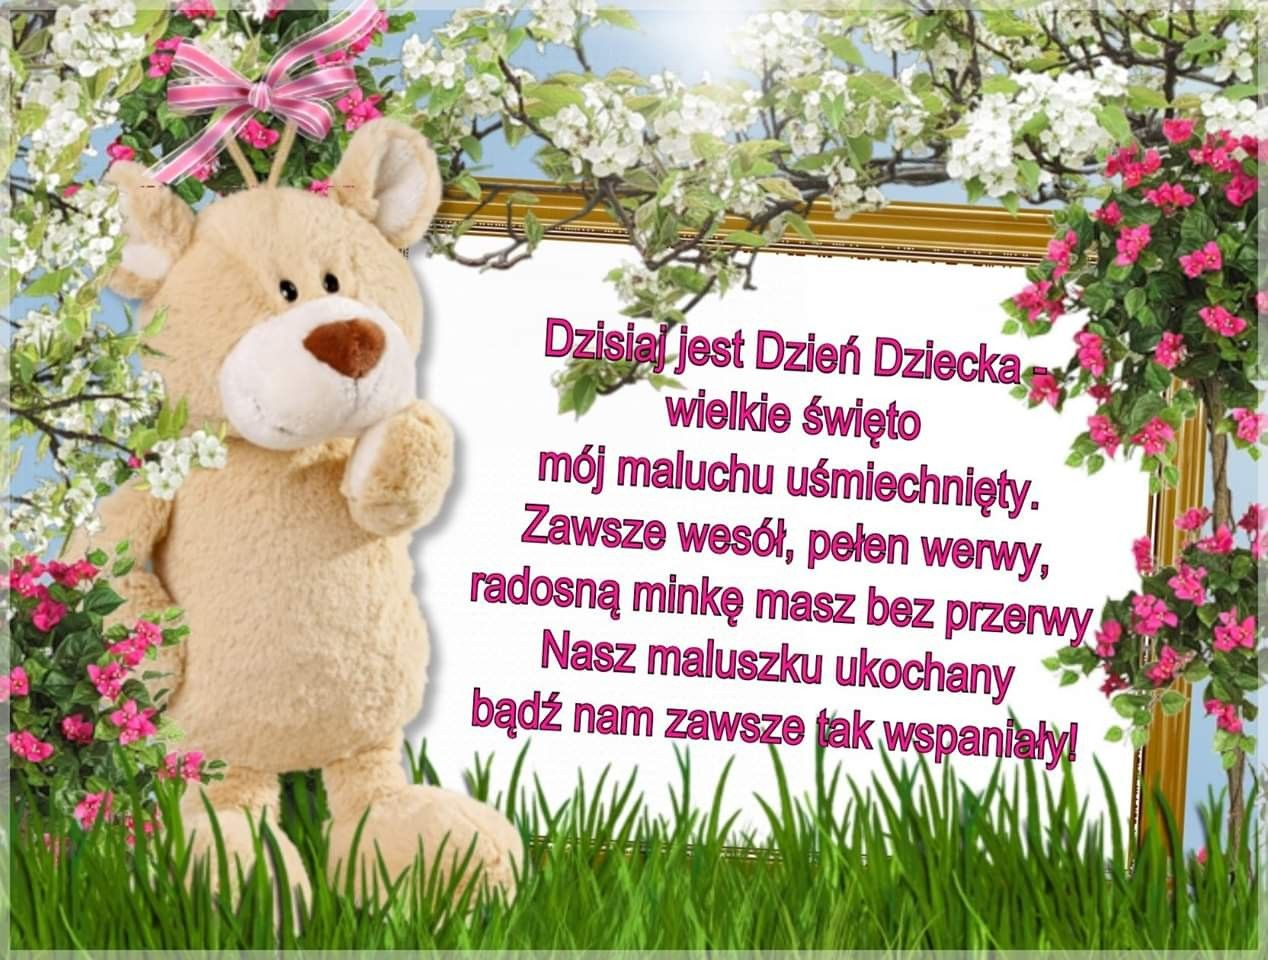 Pin By Paulina Juchniewicz On Dzien Dziecka Teddy Bear Teddy